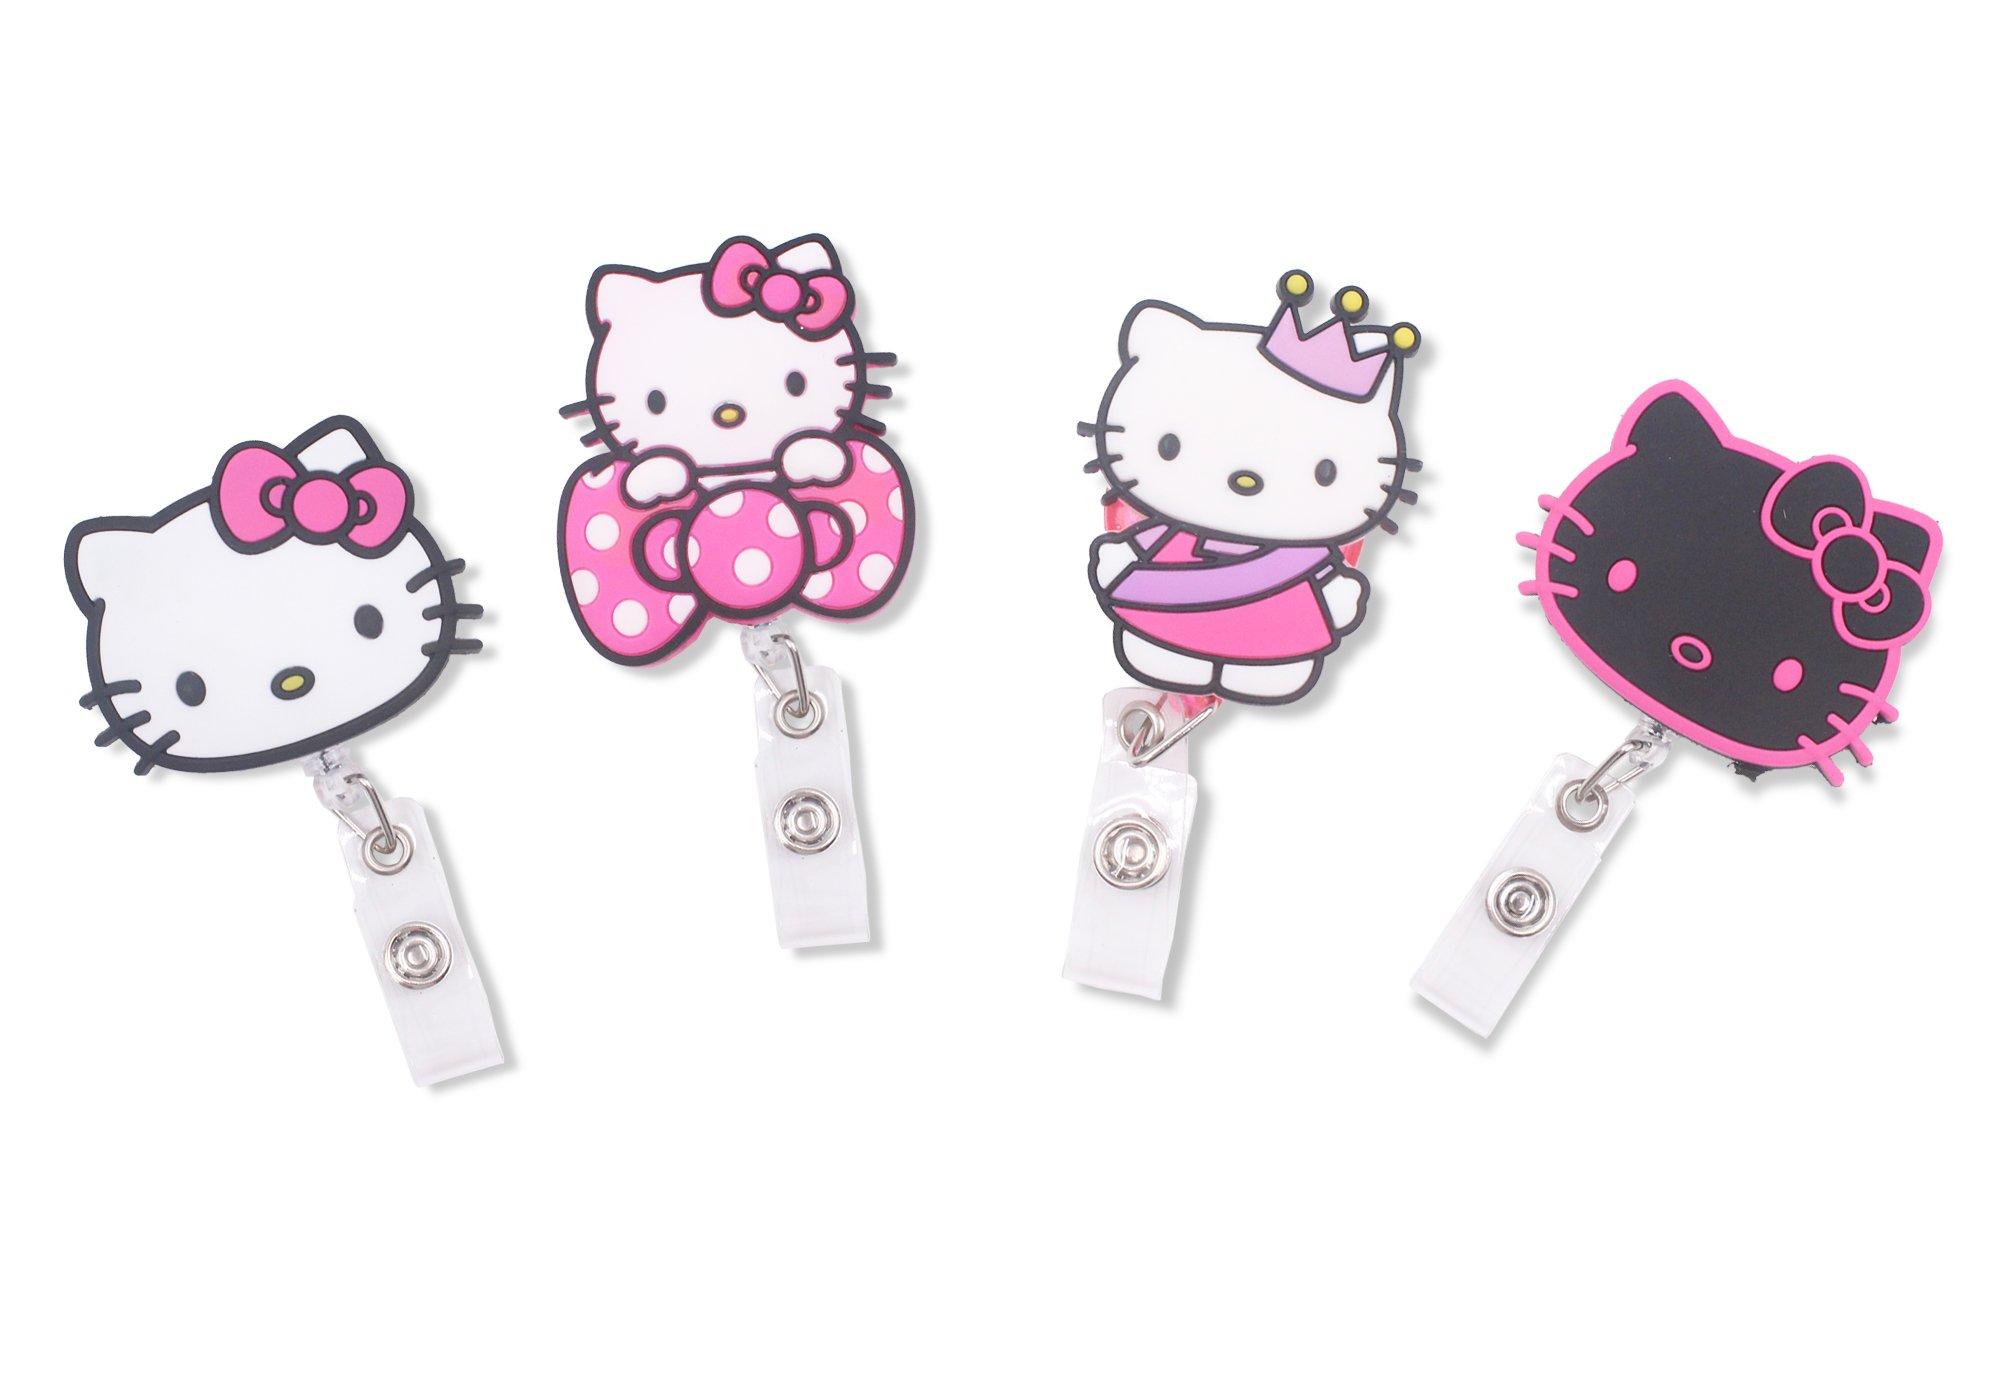 Finex Hello Kitty Set of 4 Retractable Badge Holder ID Badge Reel Clip On Card Holders